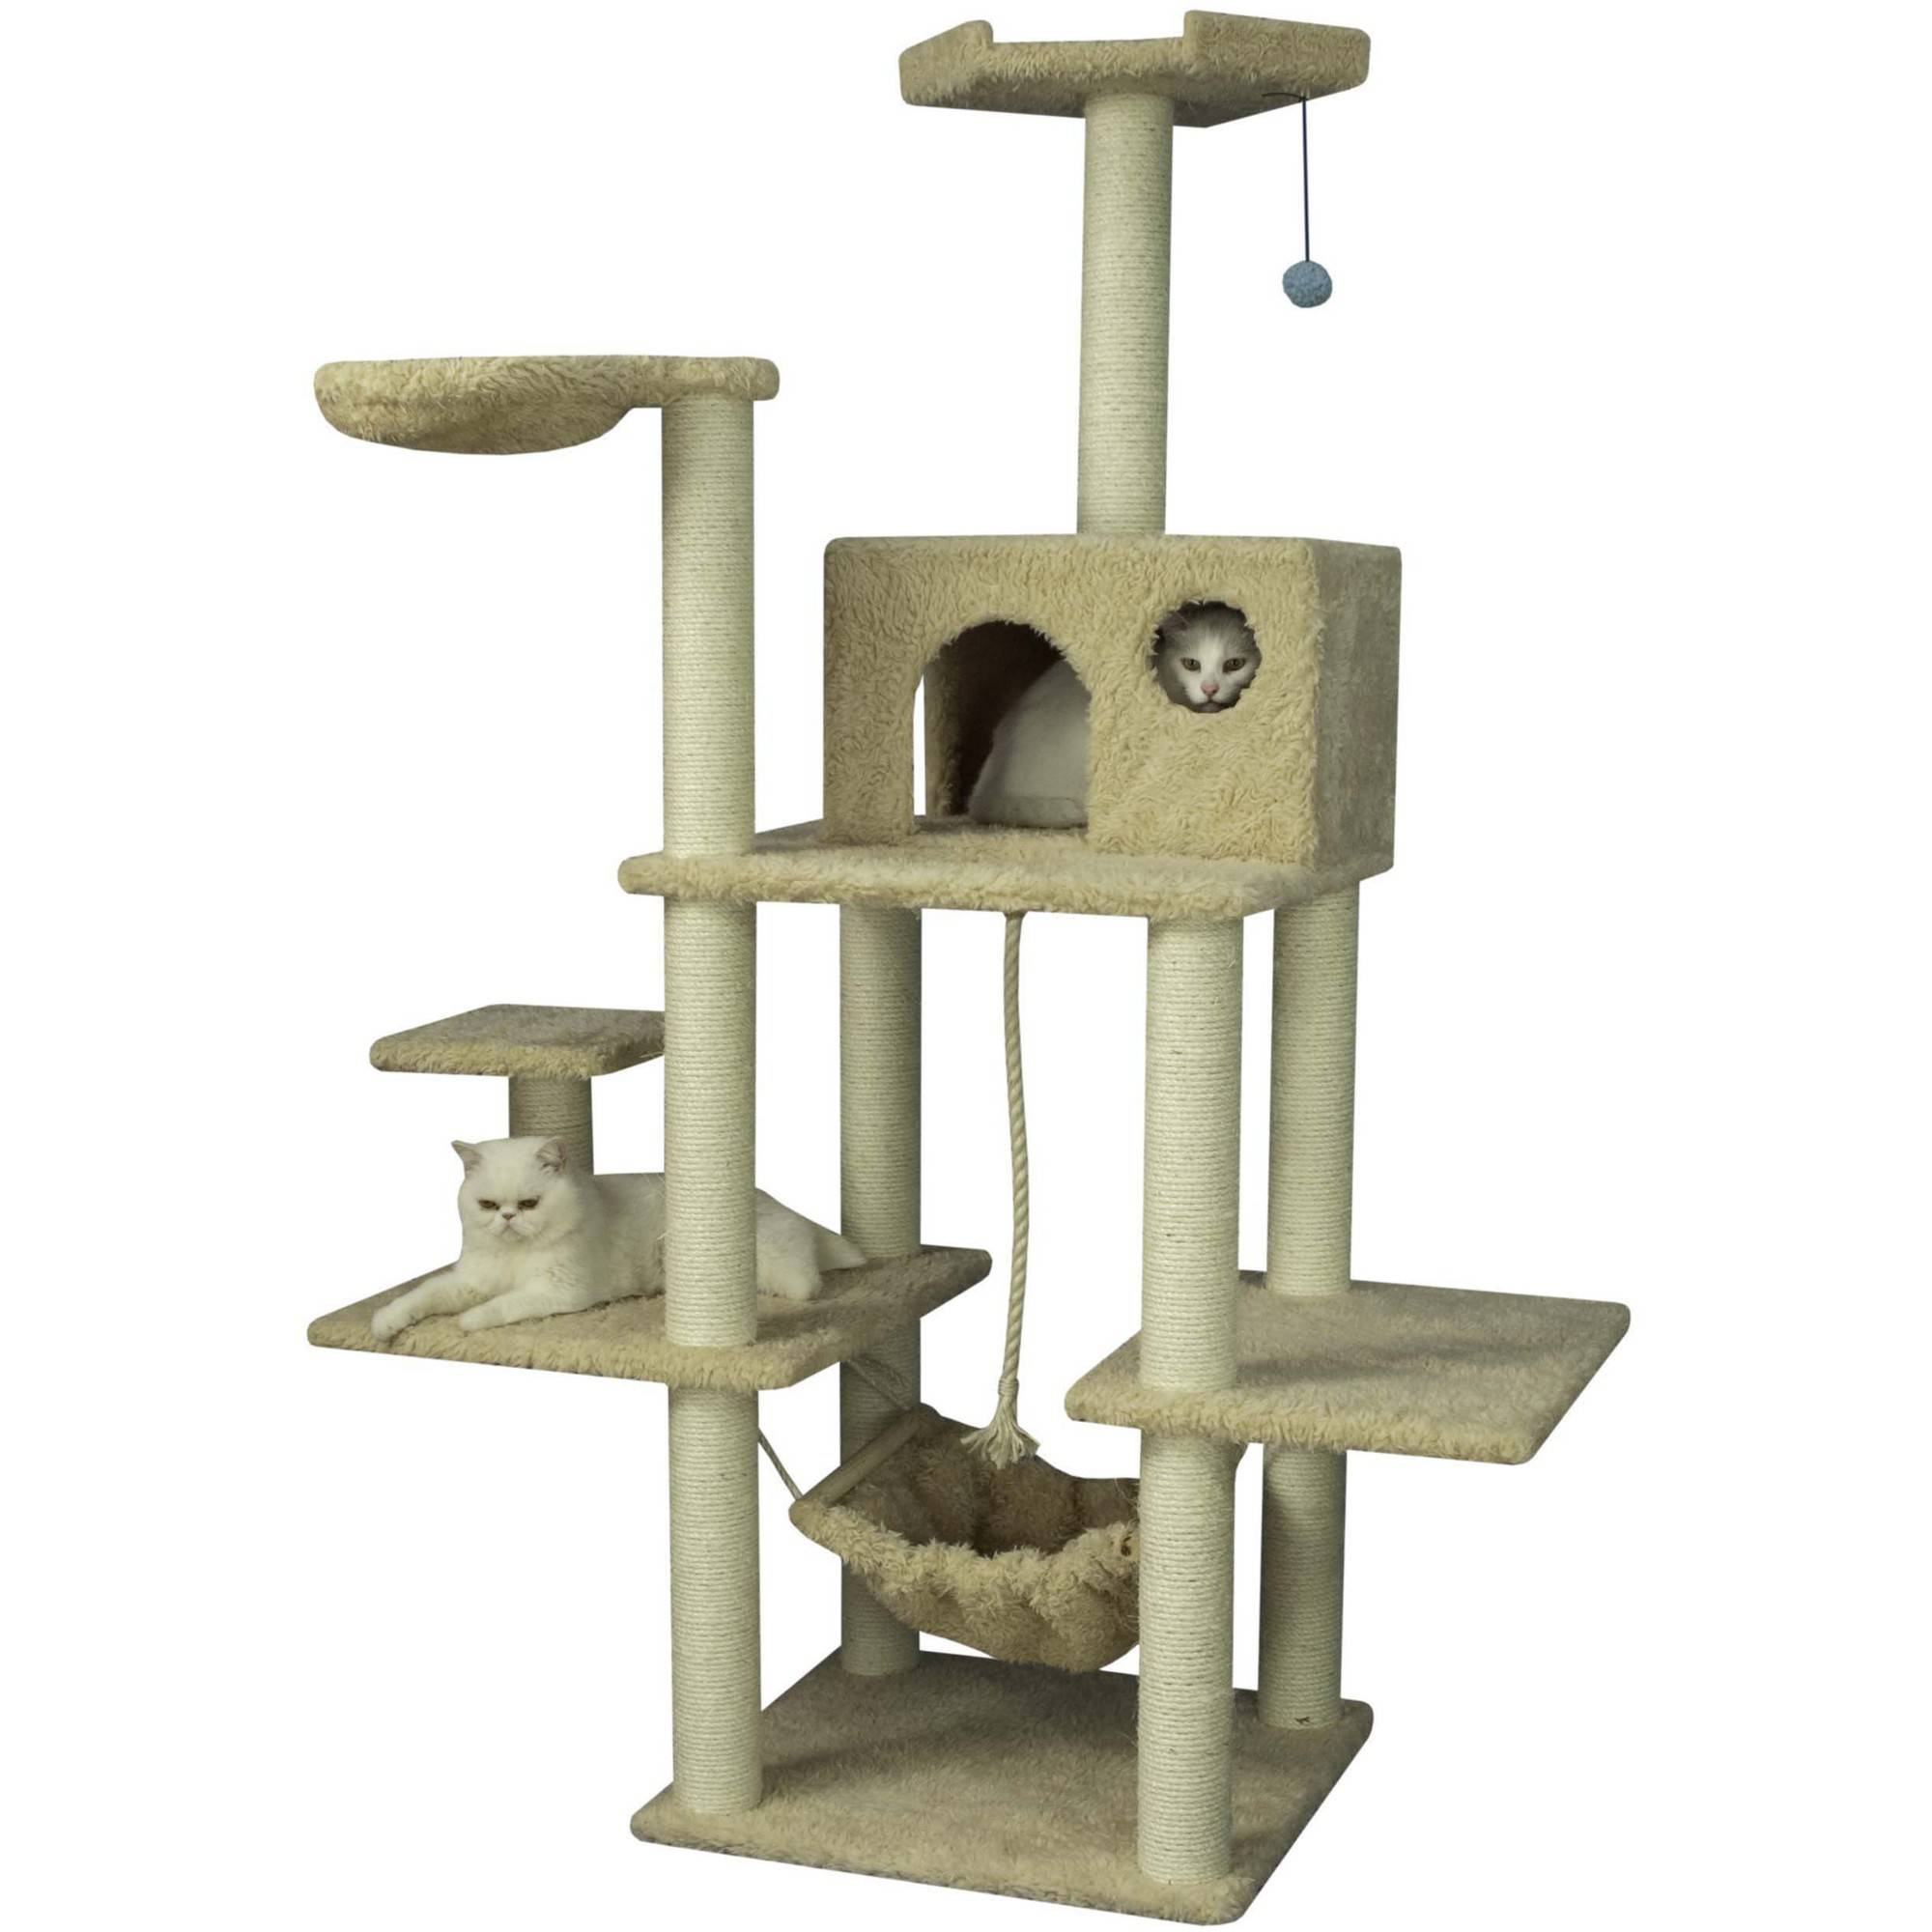 Armarkat Classic Cat Tree Model A6901, 69 inch Beige